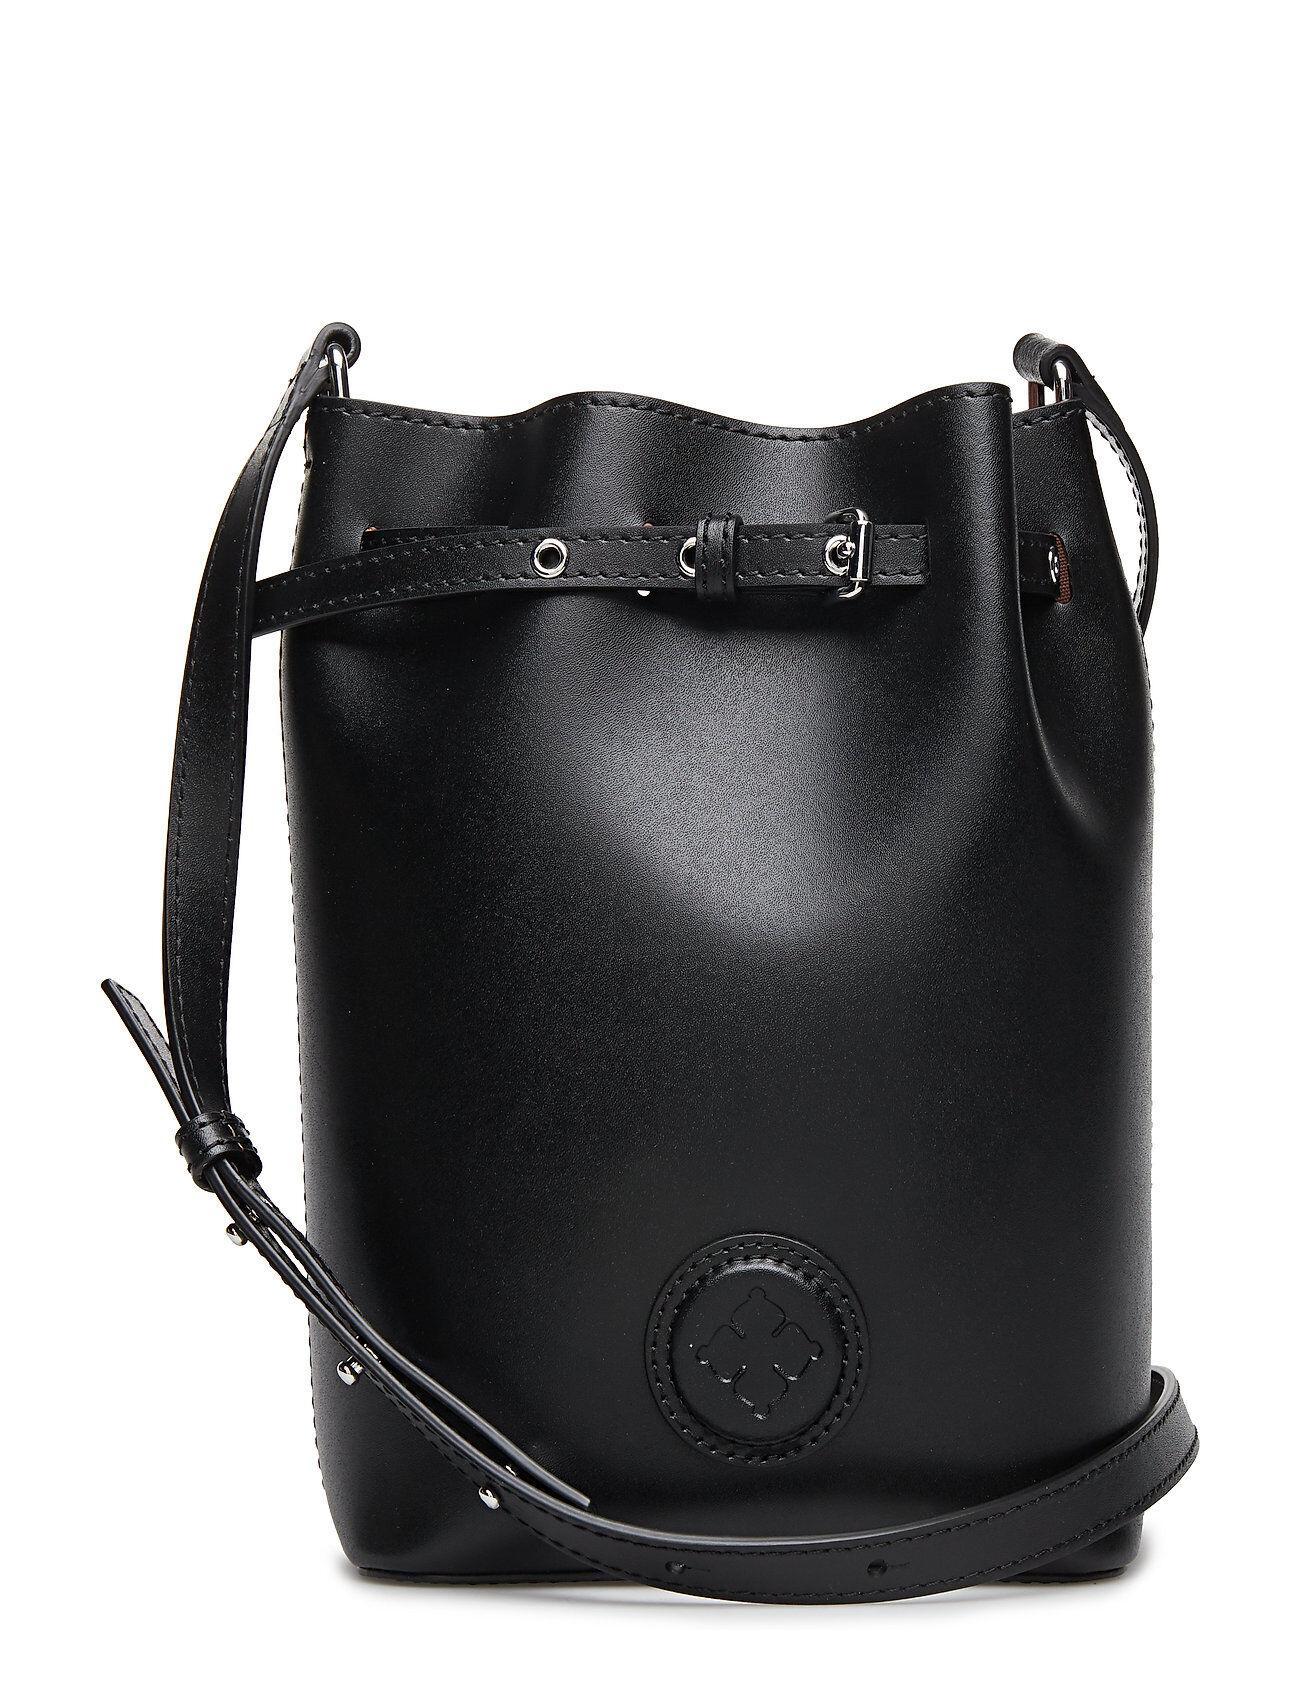 BY MALENE BIRGER Ema Mini Bags Bucket Bag Musta BY MALENE BIRGER